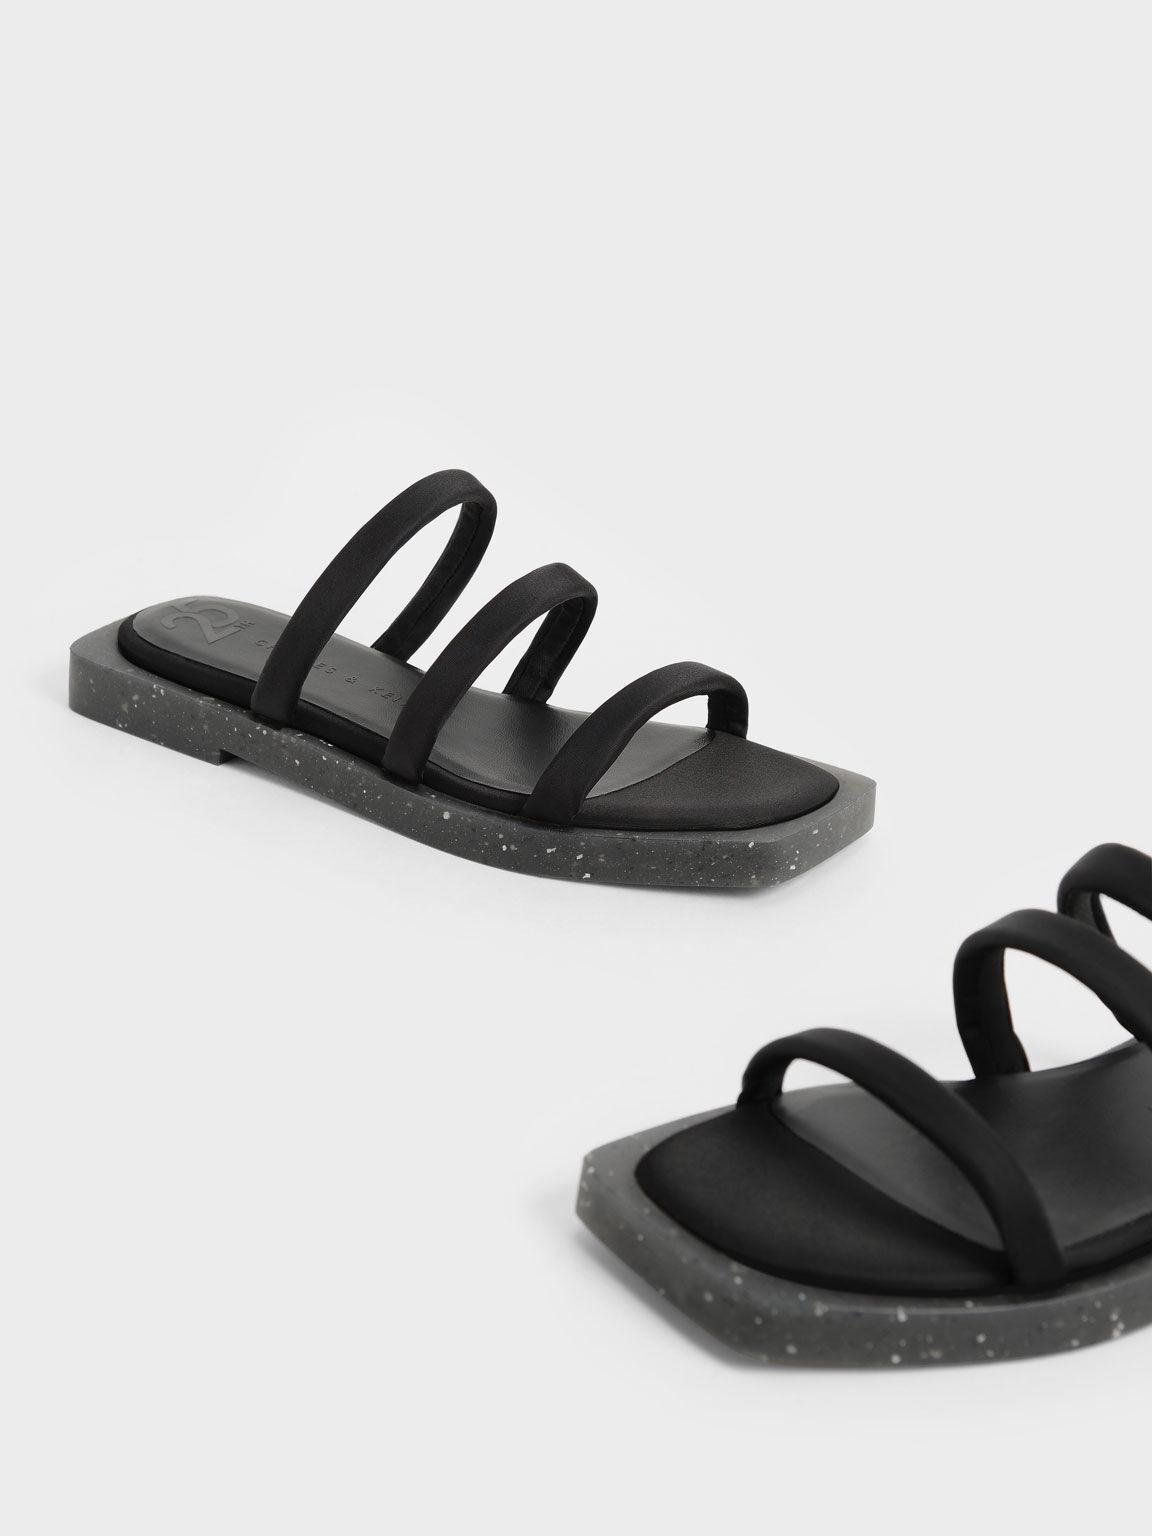 The Anniversary Series: Arabella Recycled Nylon Slide Sandals, Black, hi-res